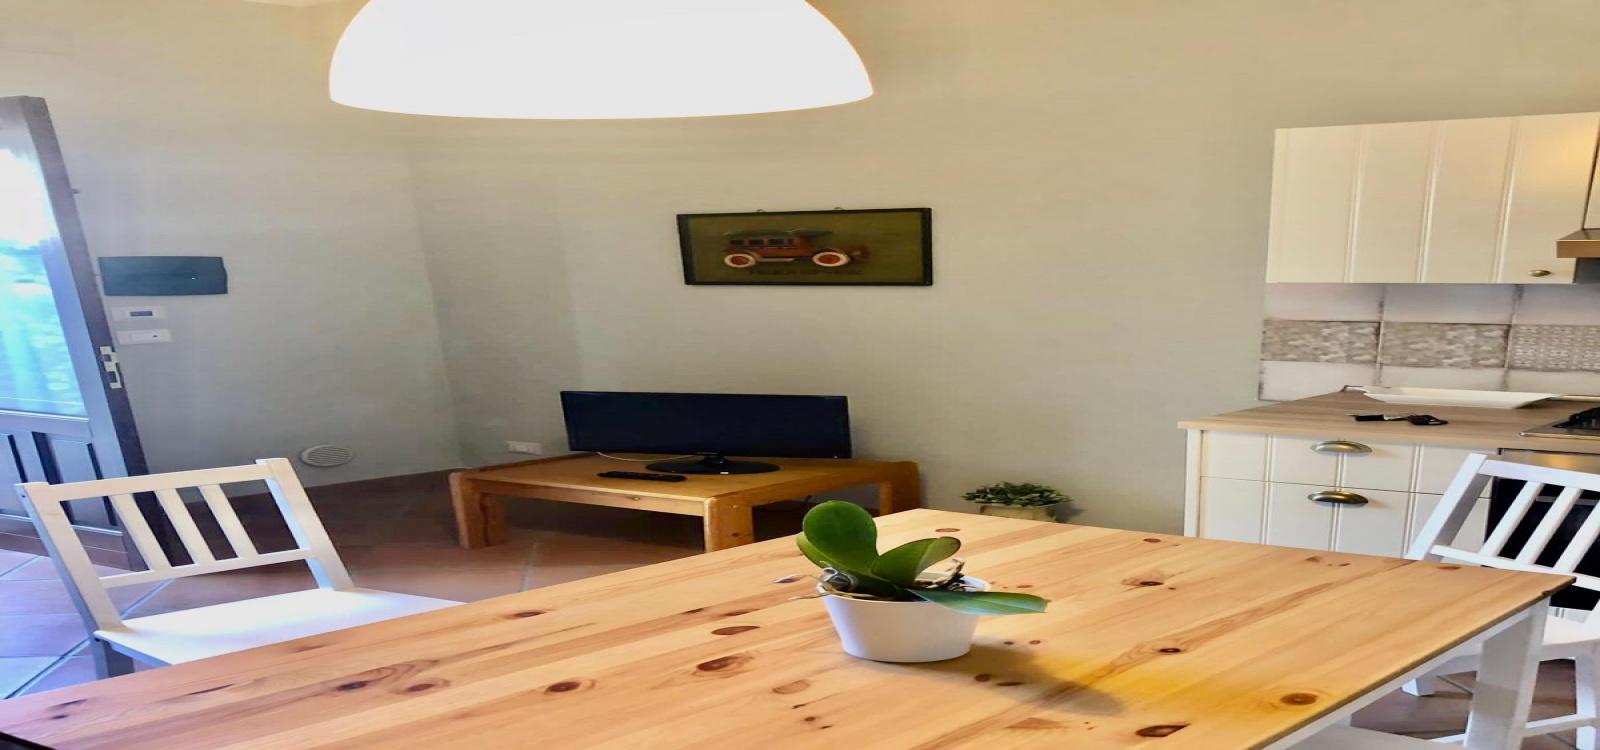 PIZZUTA,SIRACUSA,Appartamento,PIZZUTA,2419